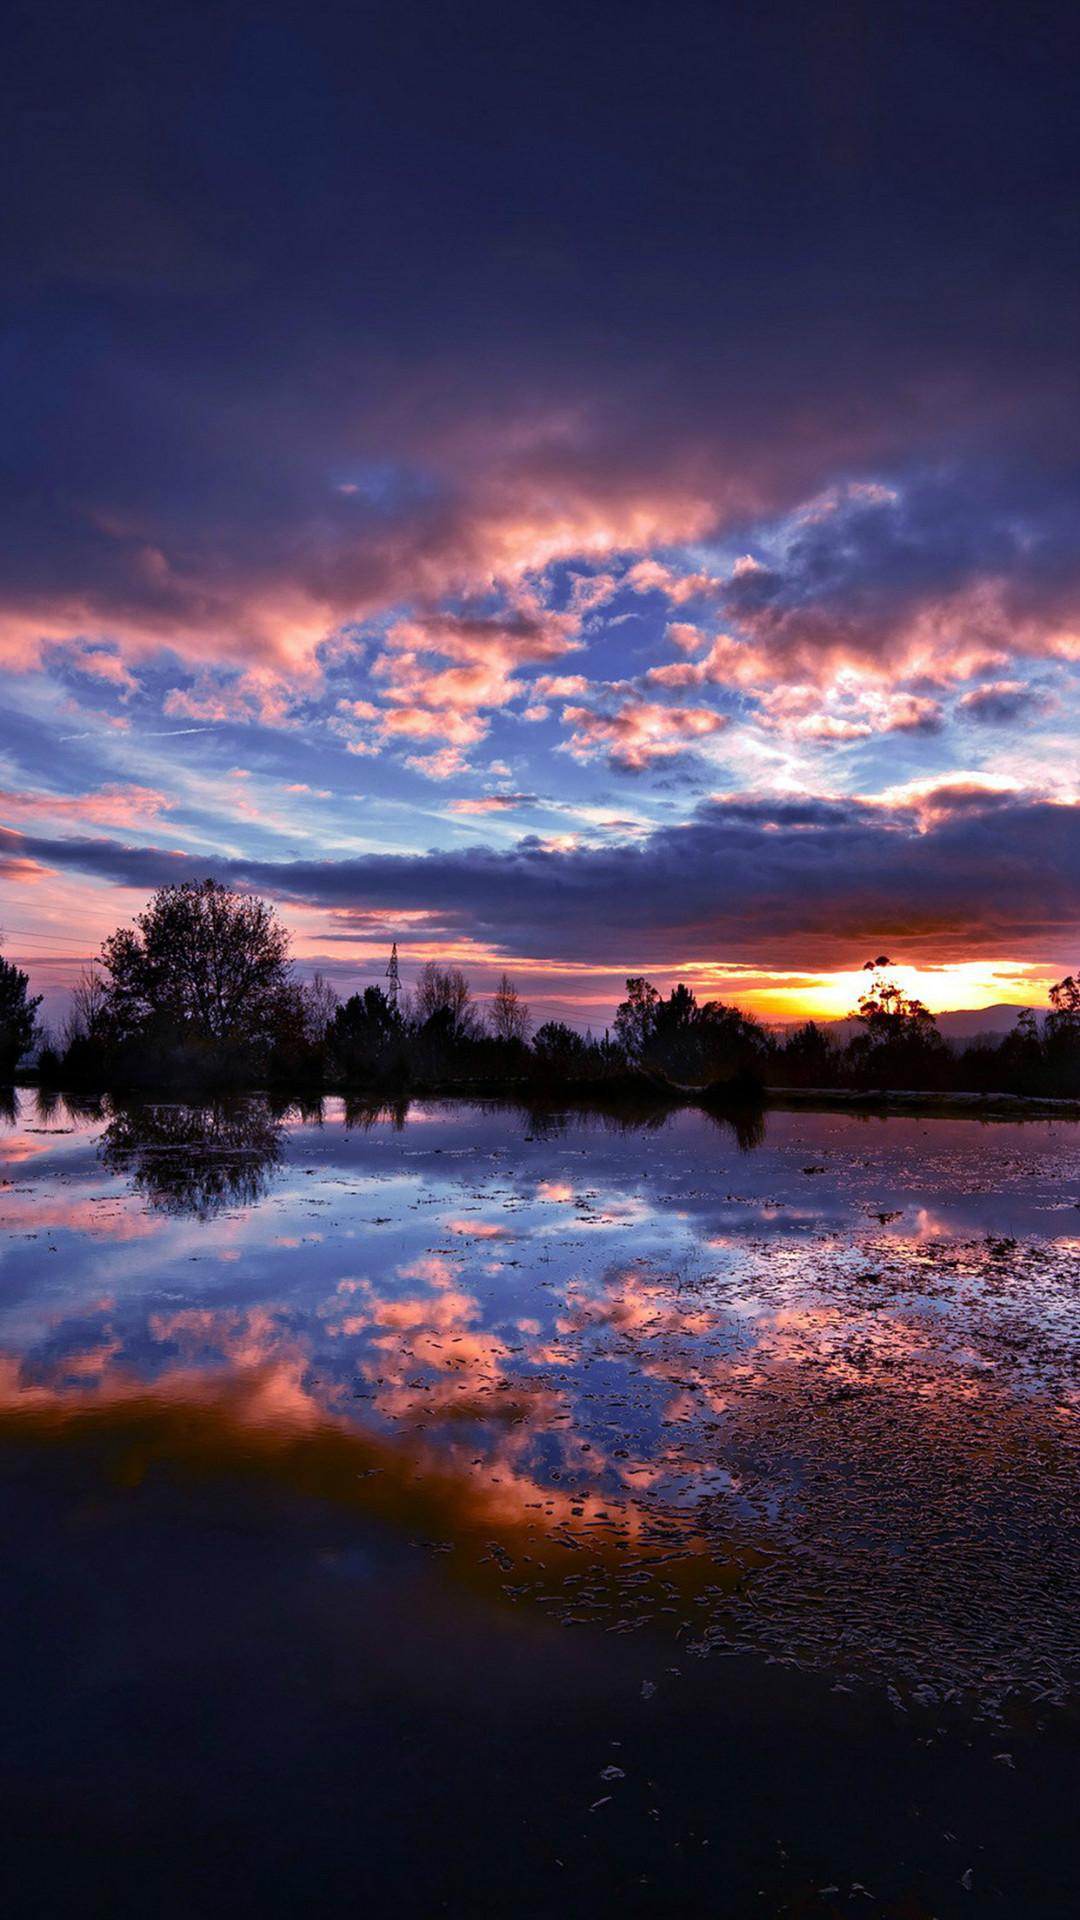 Nature Fantasy Sunset Landscape iPhone 8 wallpaper